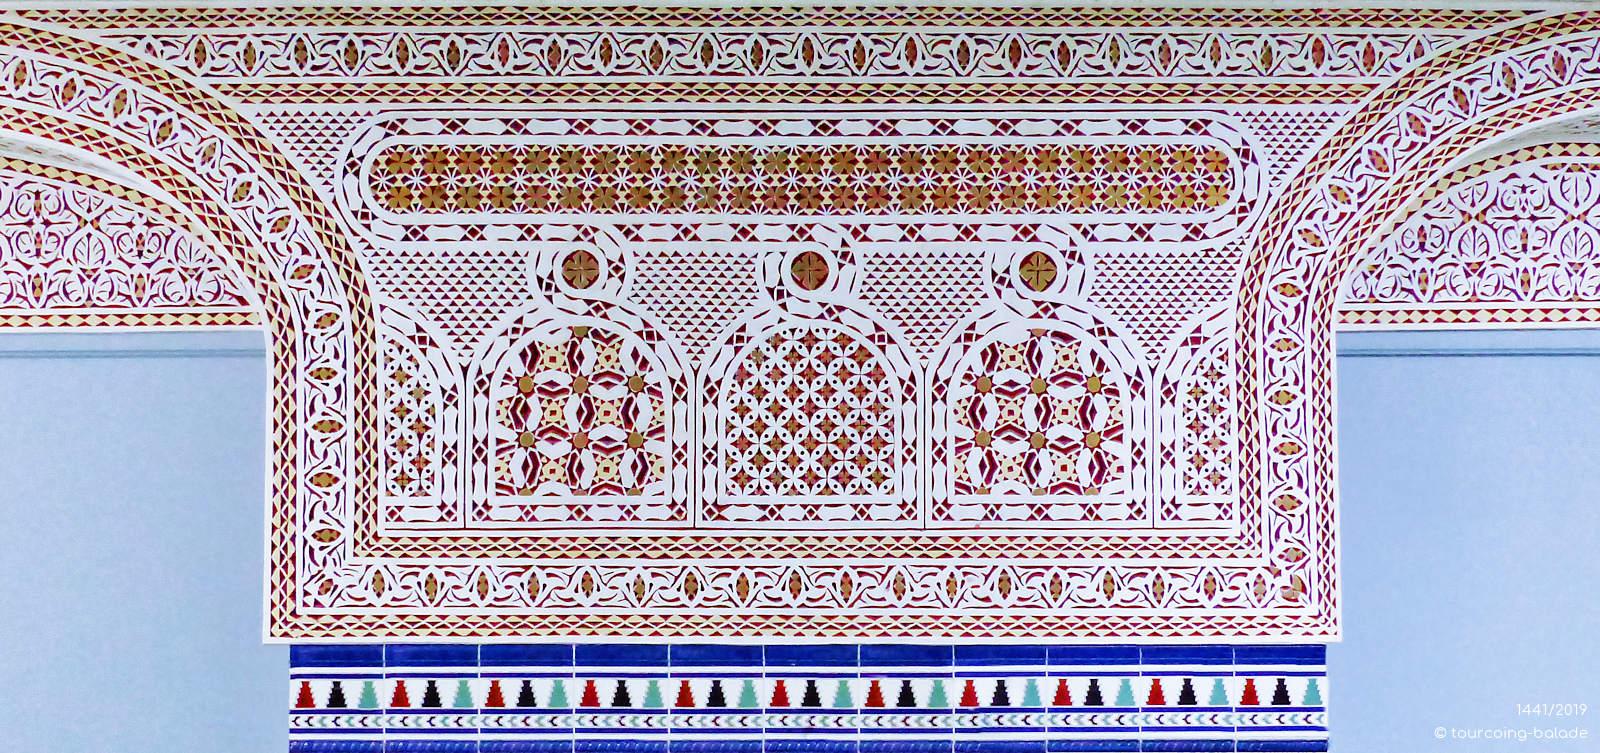 Masjid es-Salam Tourcoing - Motifs décoratifs